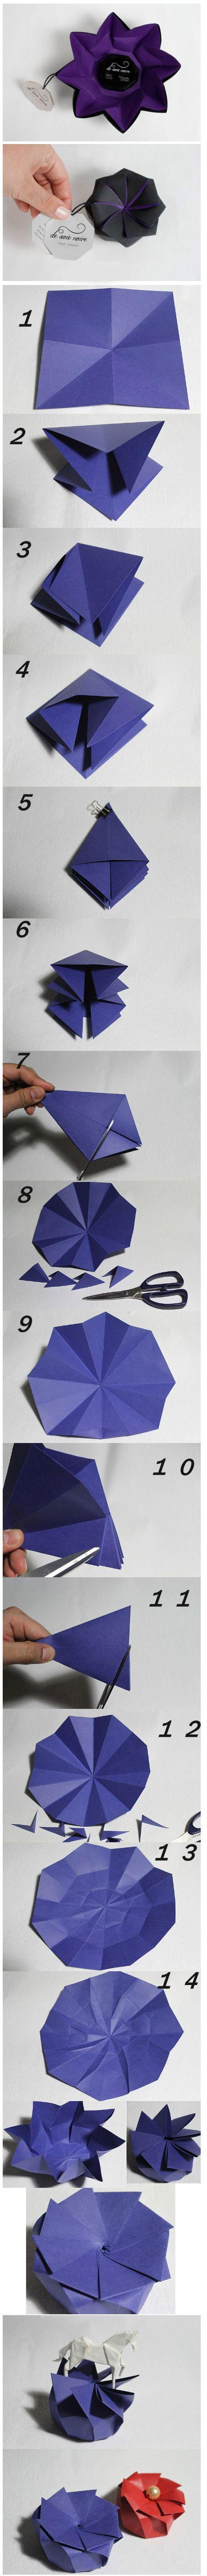 Diy Nice Paper Flower | DIY & Crafts Tutorials